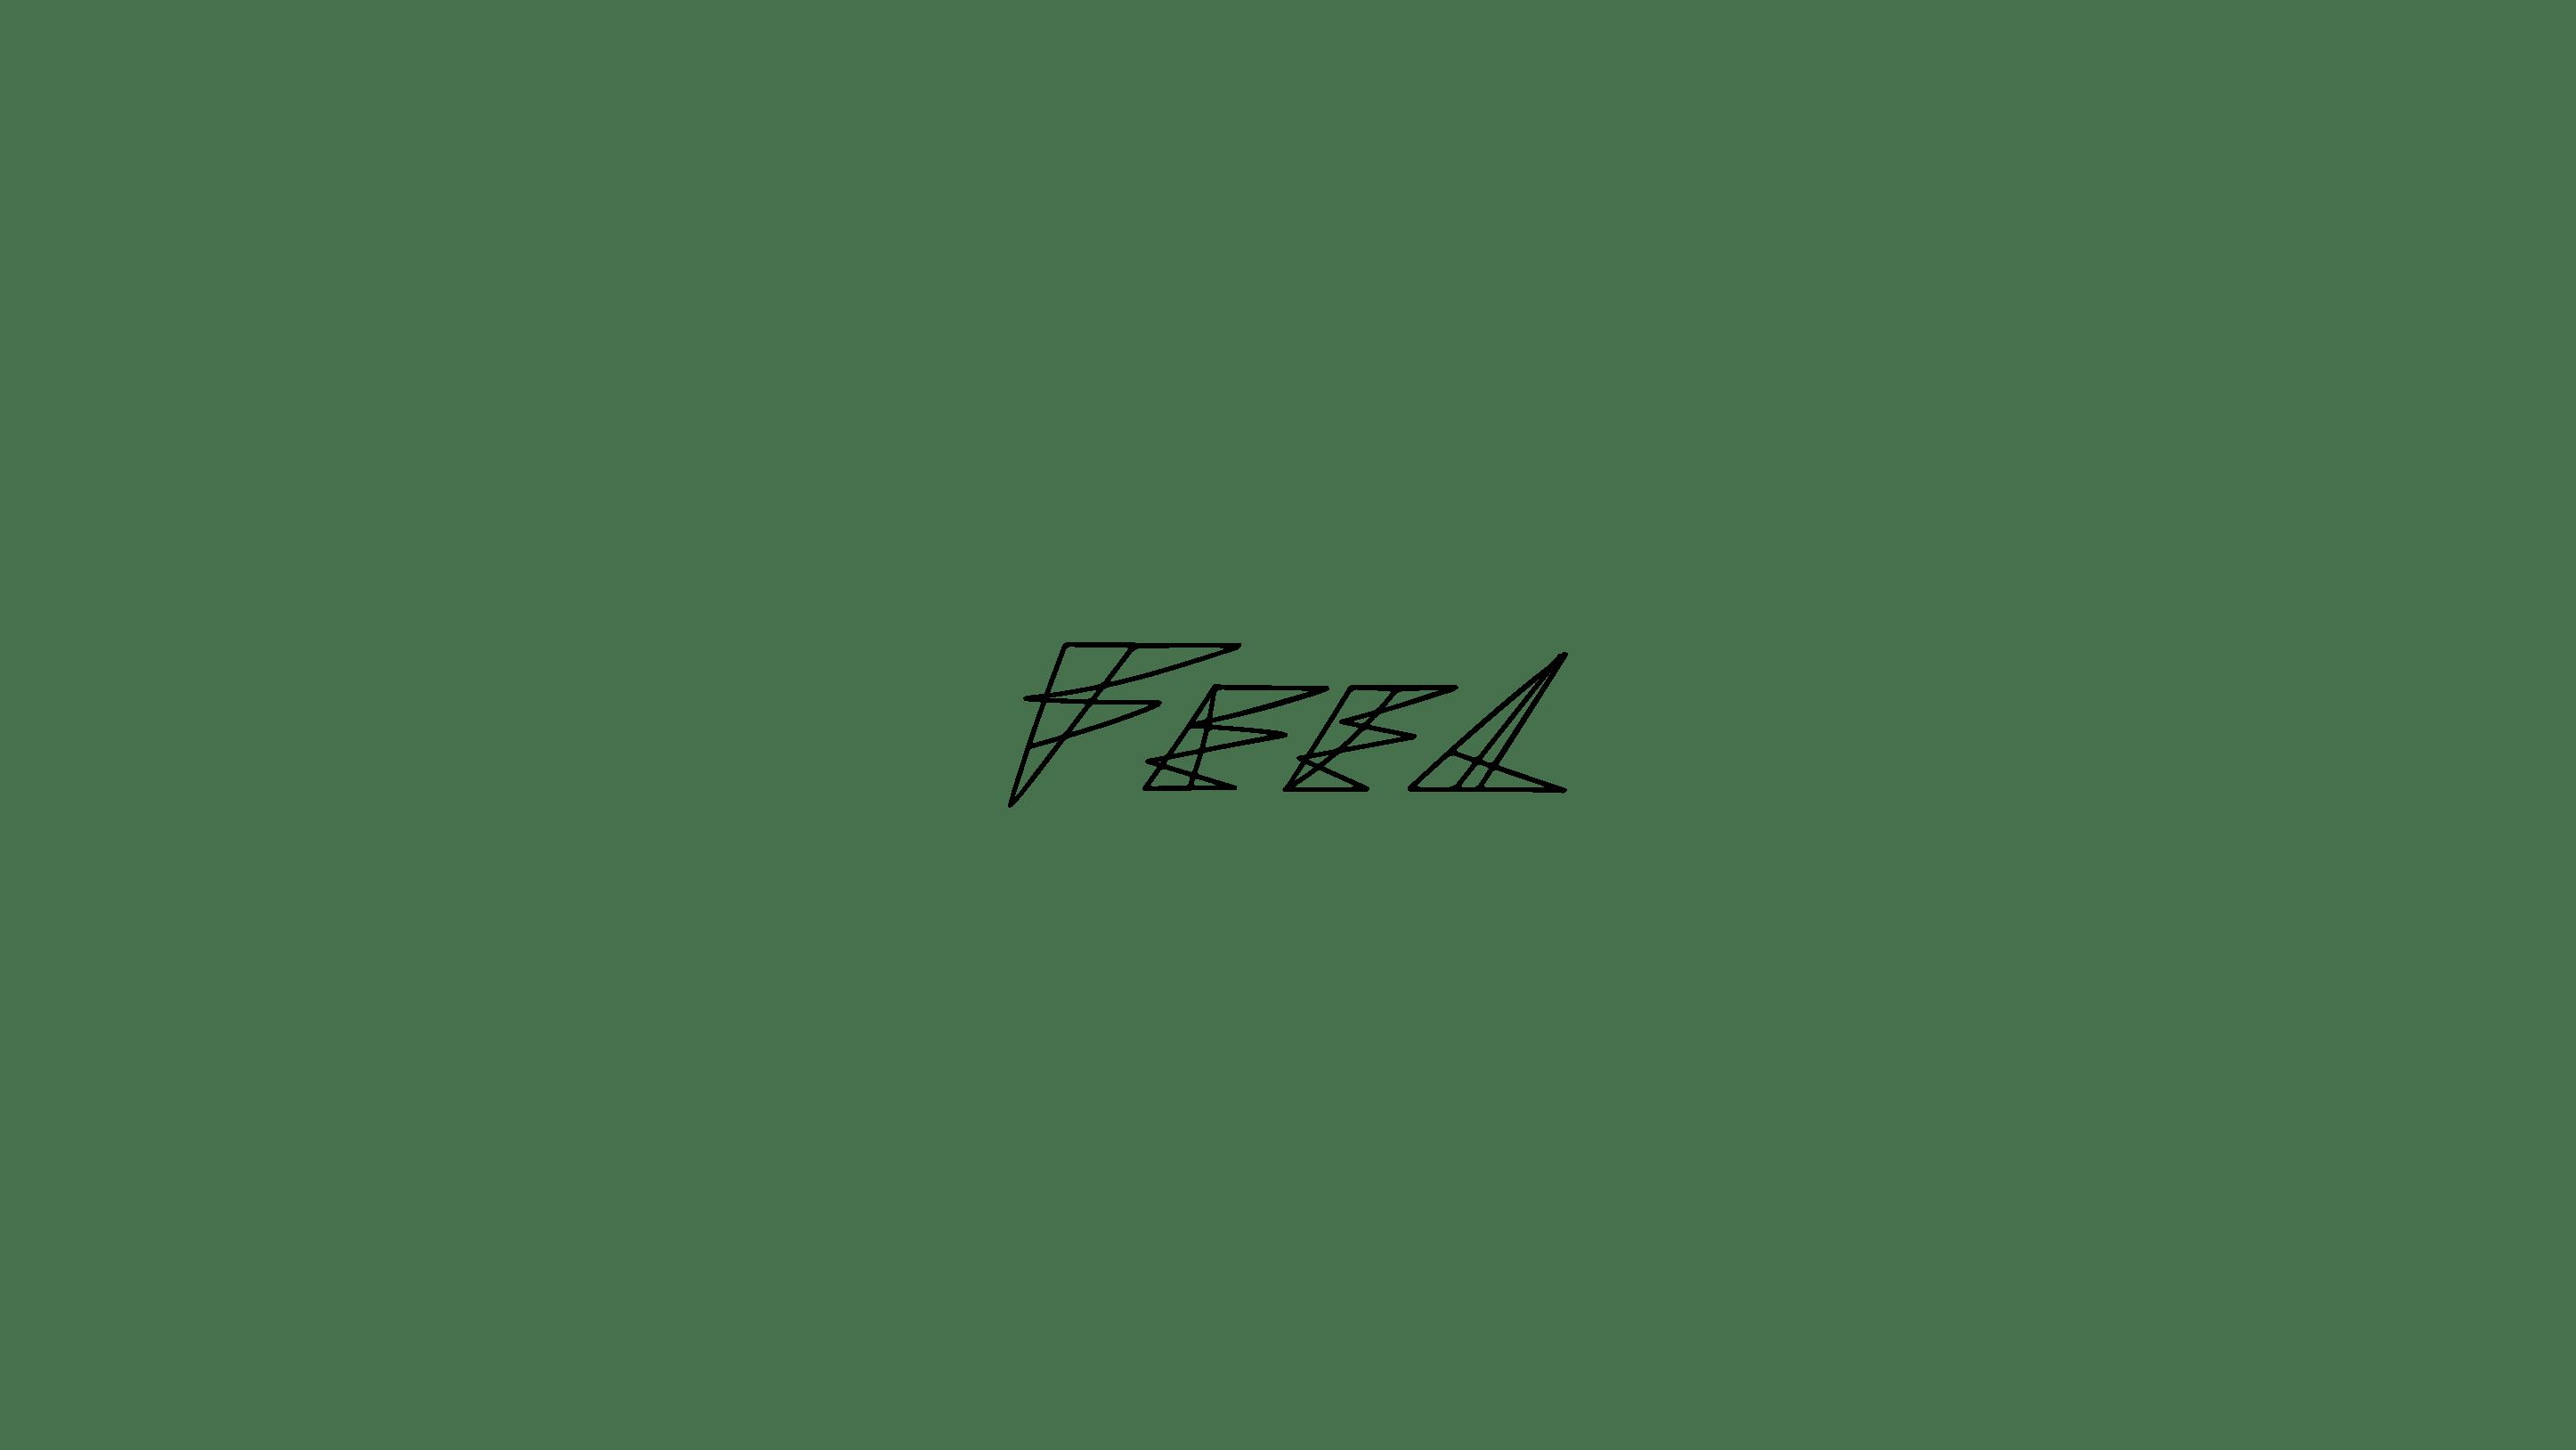 FEEL KYOTO